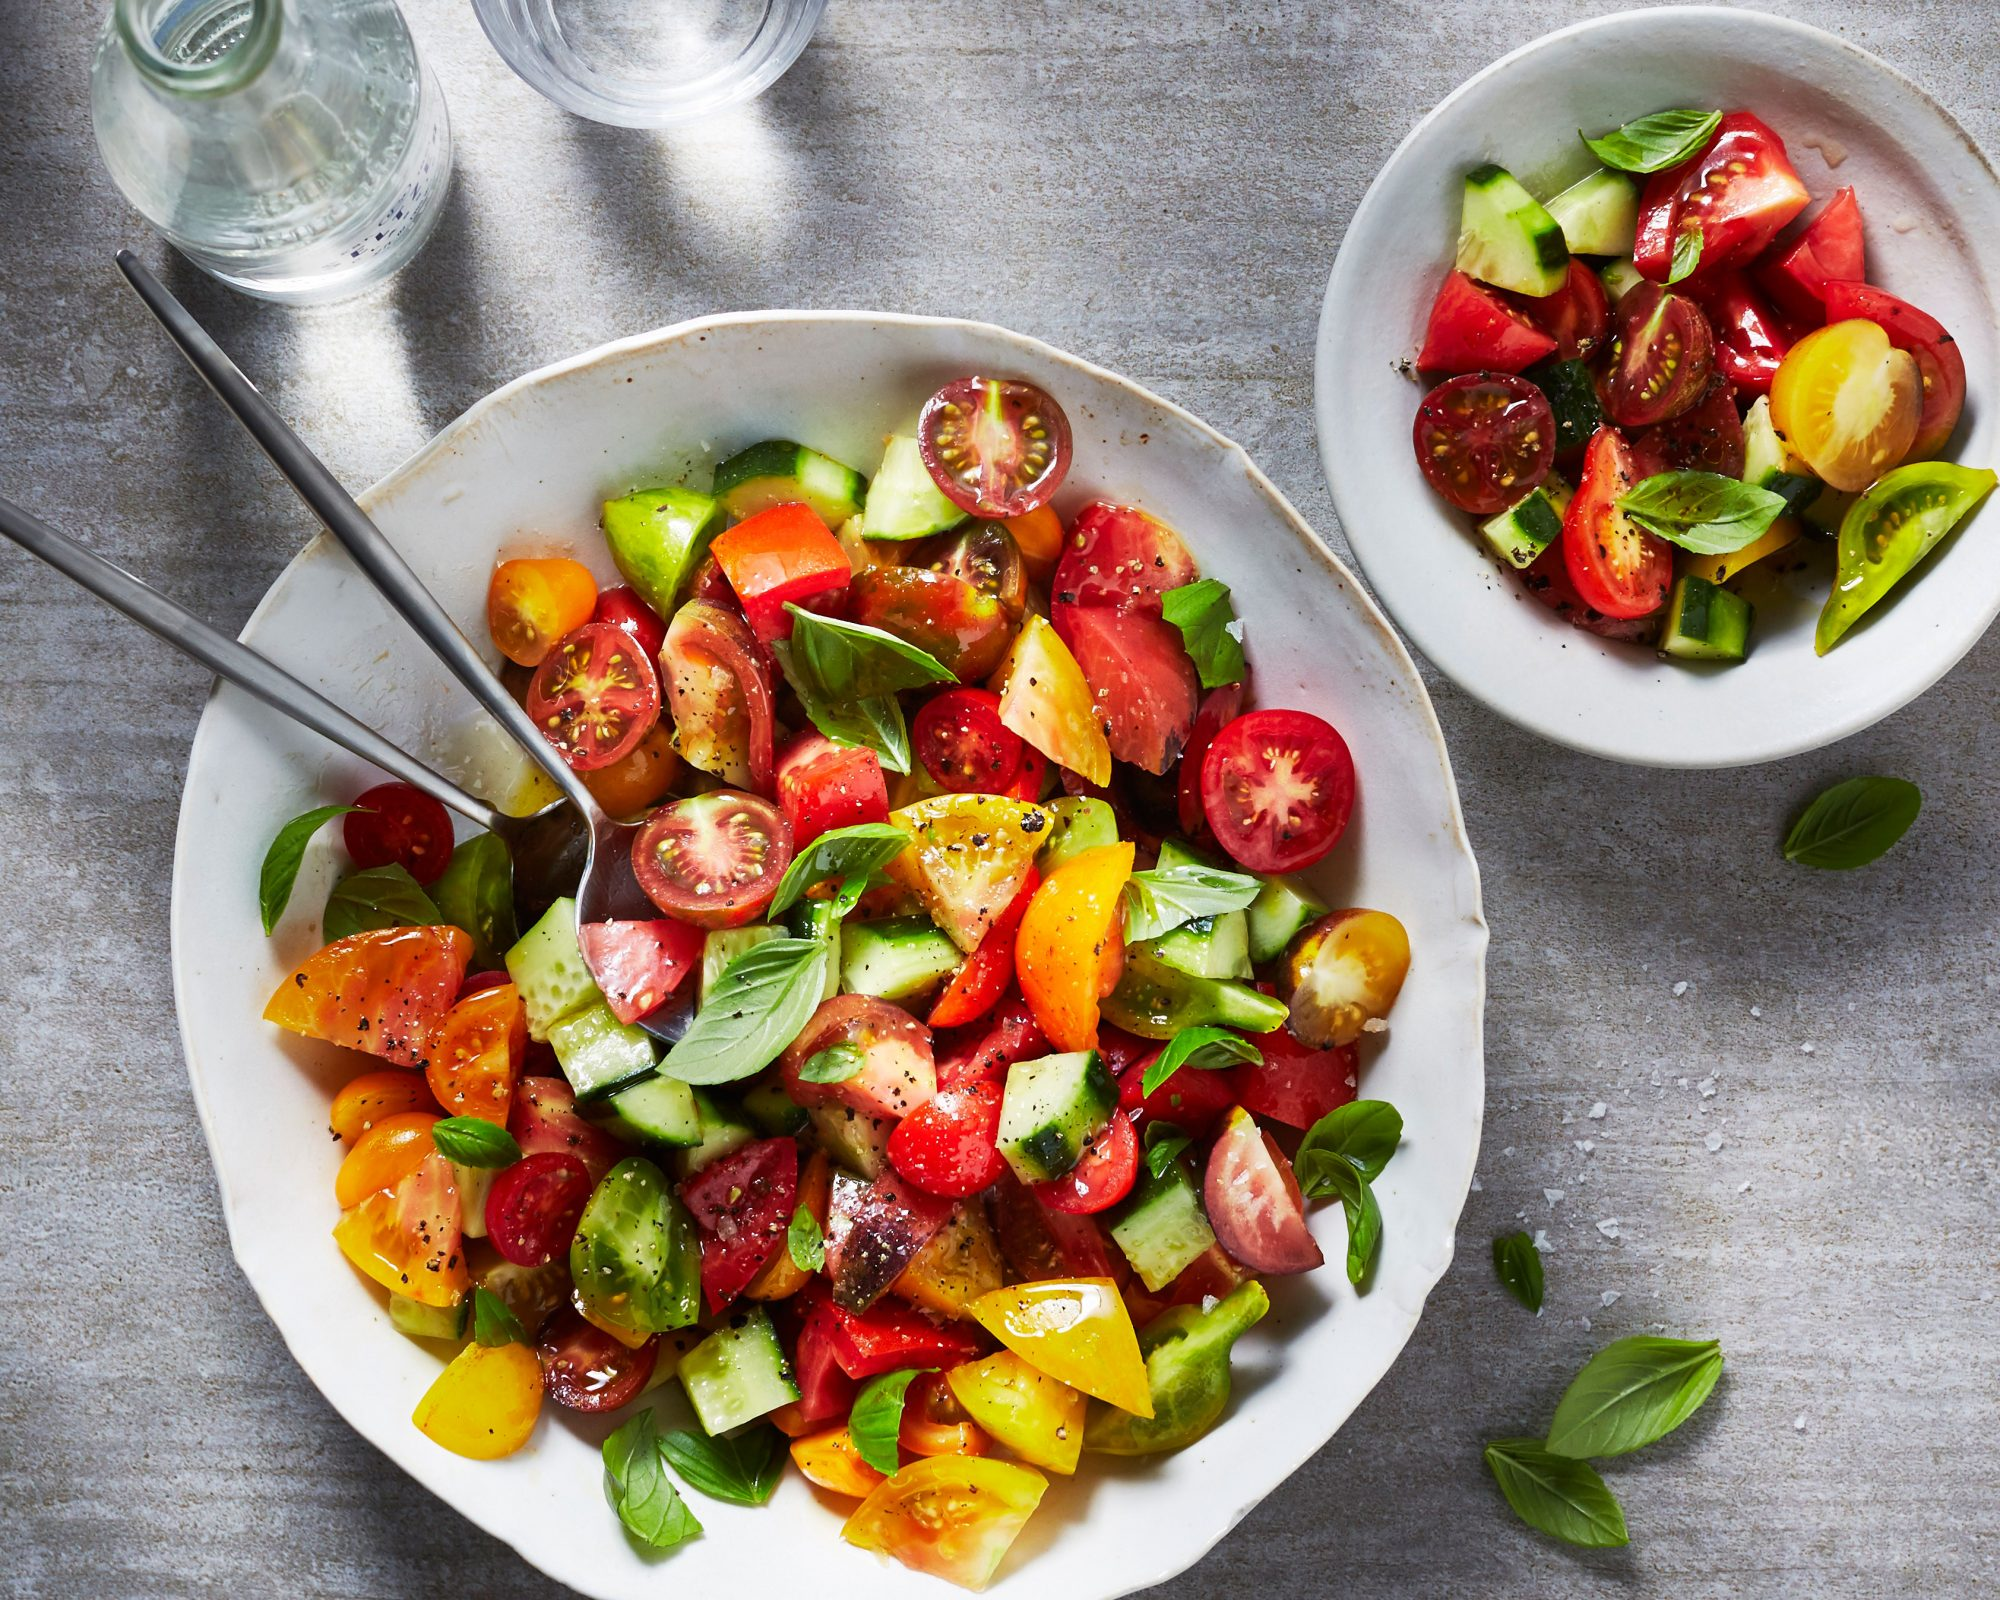 Tomato, Cucumber, and Basil Salad